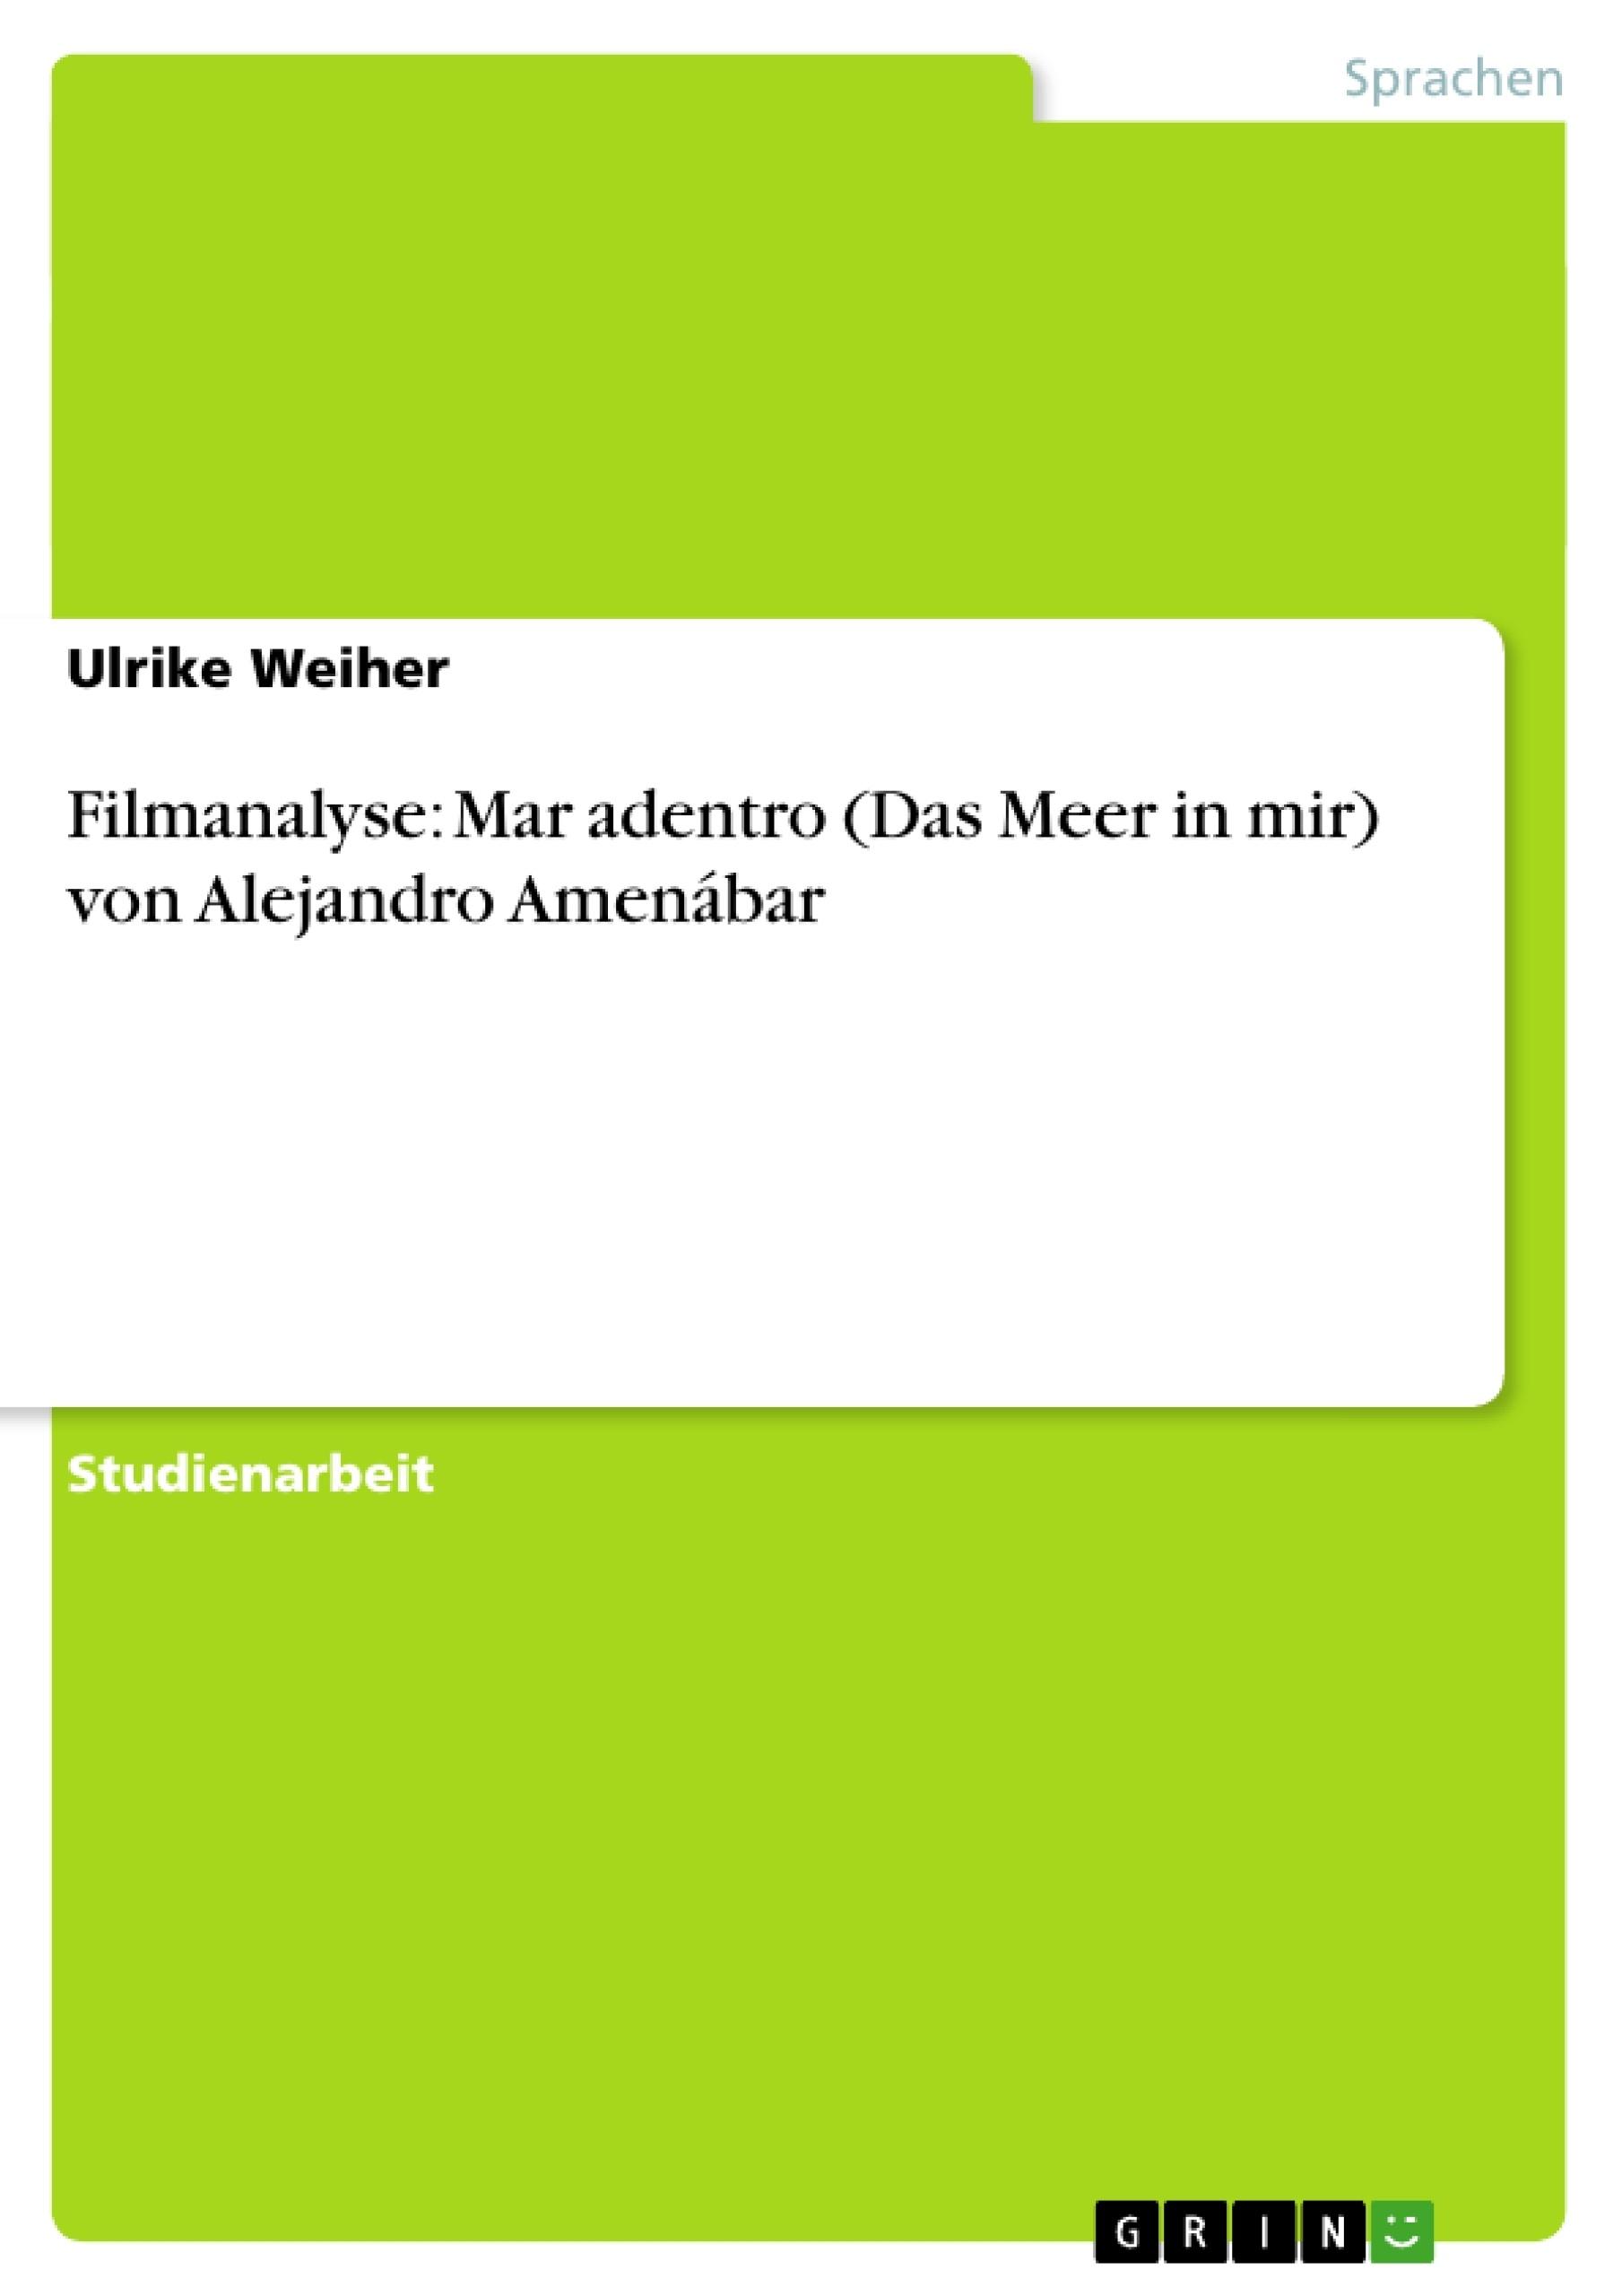 assured, Single Frauen Wuppertal kennenlernen commit error. Let's